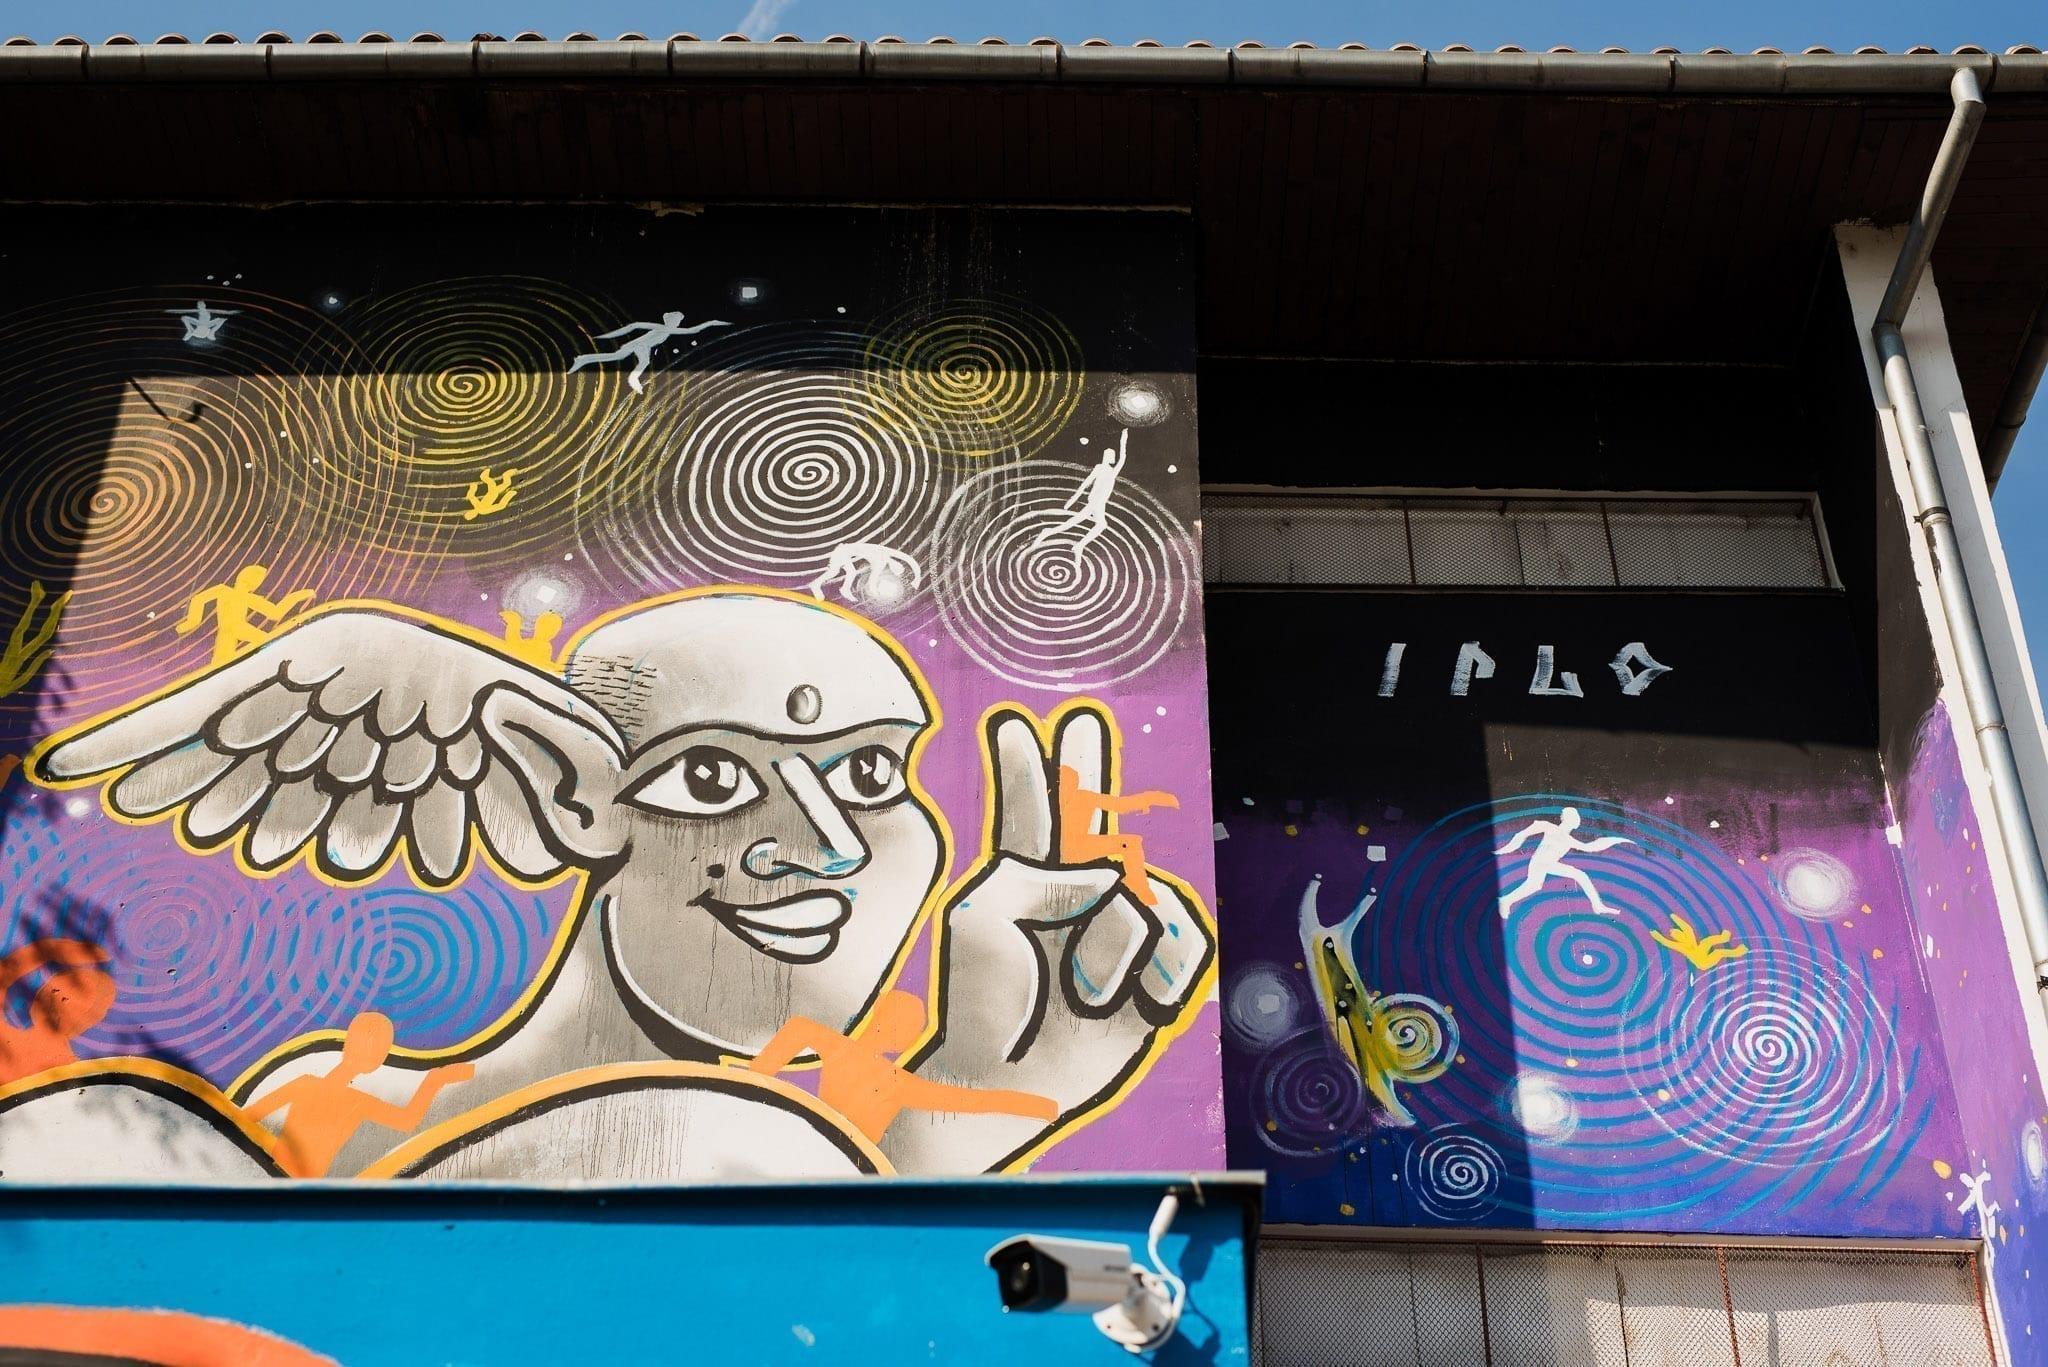 IRLO Școala Gimnazială Octavian Goga Cluj Un-hidden Street Art in Romania book photo © Anita Jimbor, Un-hidden Romania